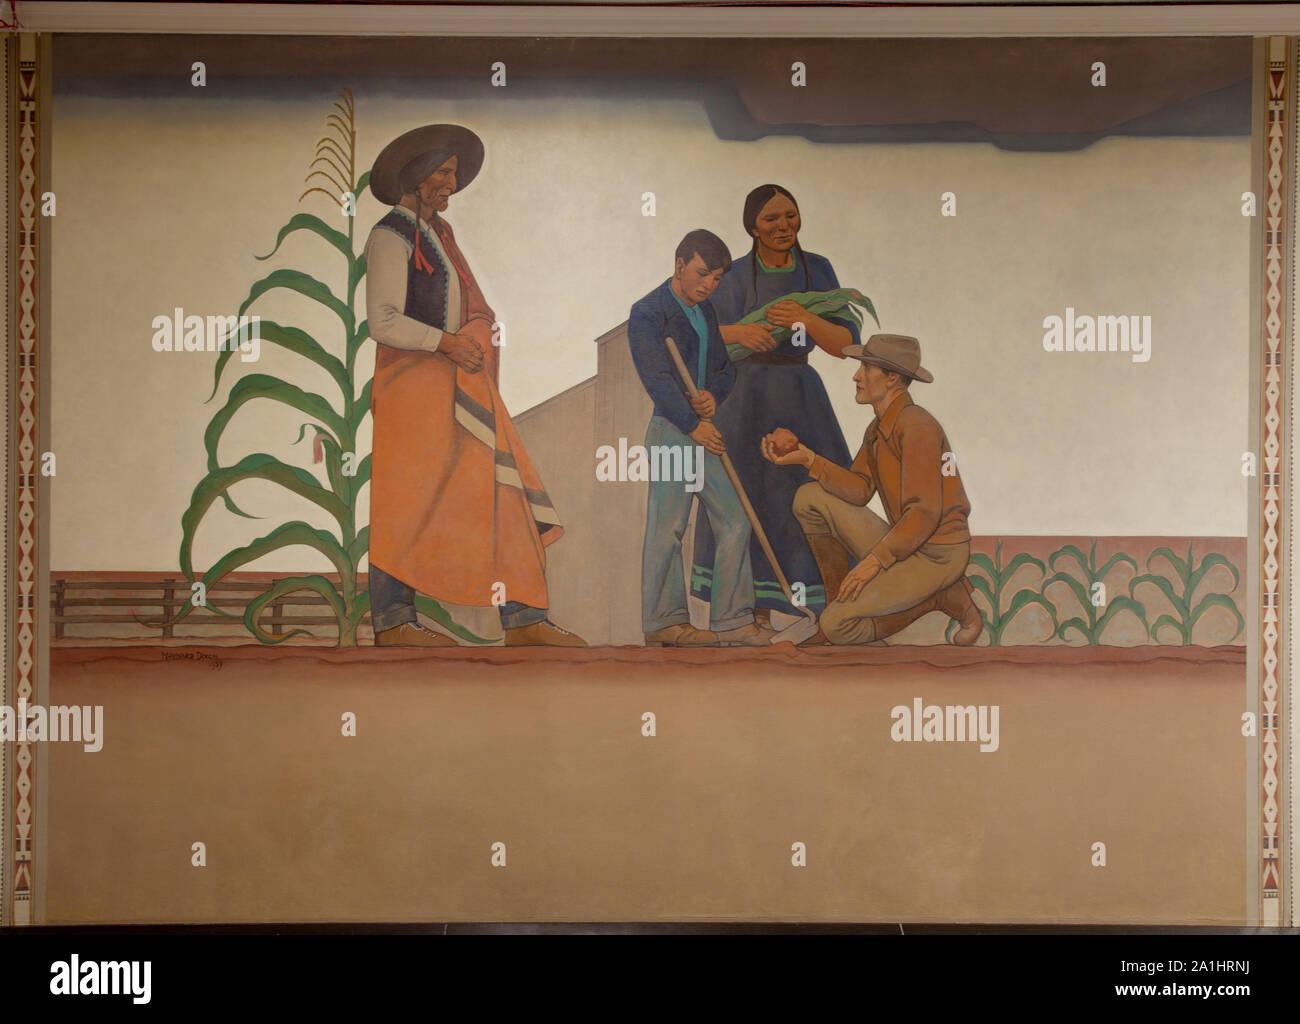 Mural: Bureau of Indian Affairs: Indian & Teacher, by Maynard Dixon at the Department of Interior, Washington, D.C Stock Photo